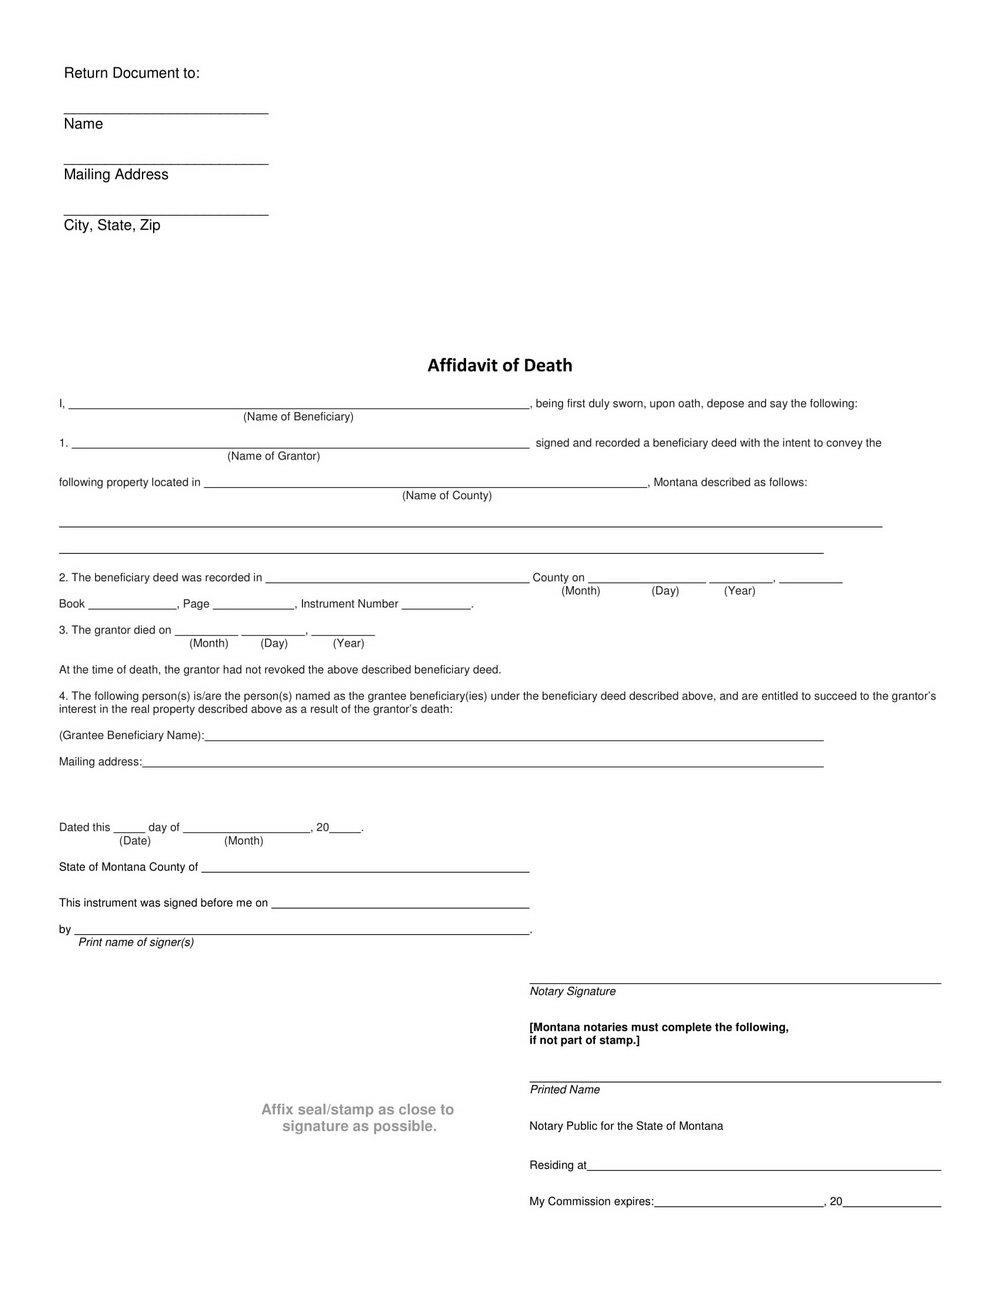 Free Small Estate Affidavit Form Indiana